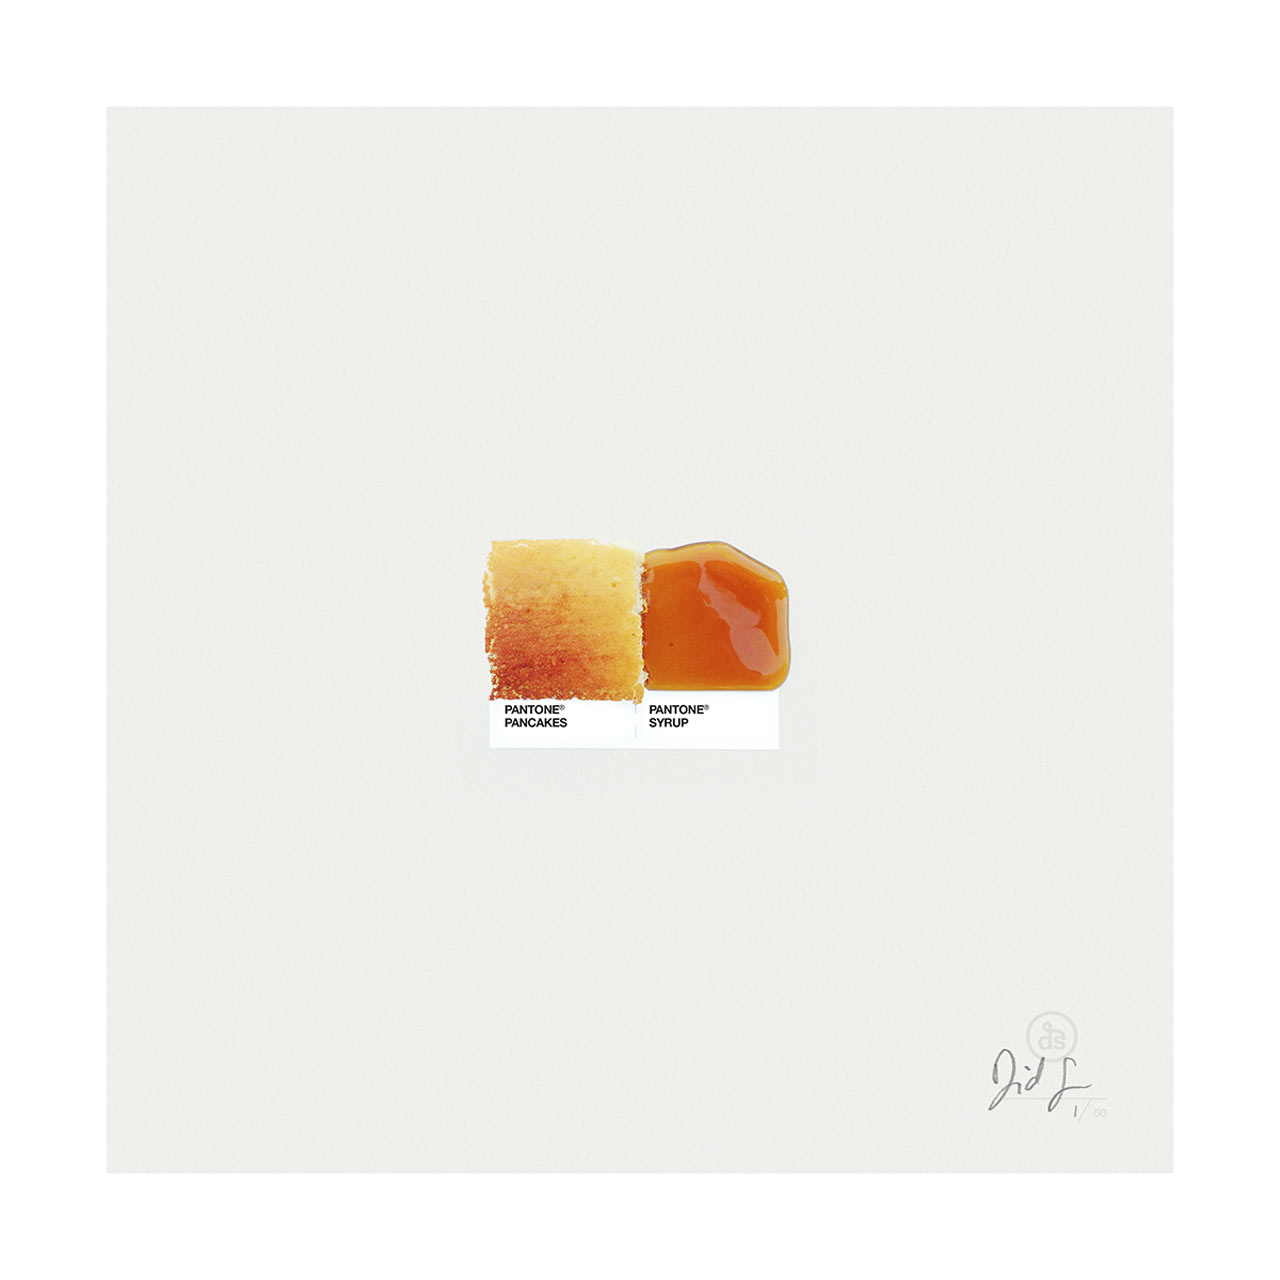 Pantone-Pairings-15_pancakes_syrup